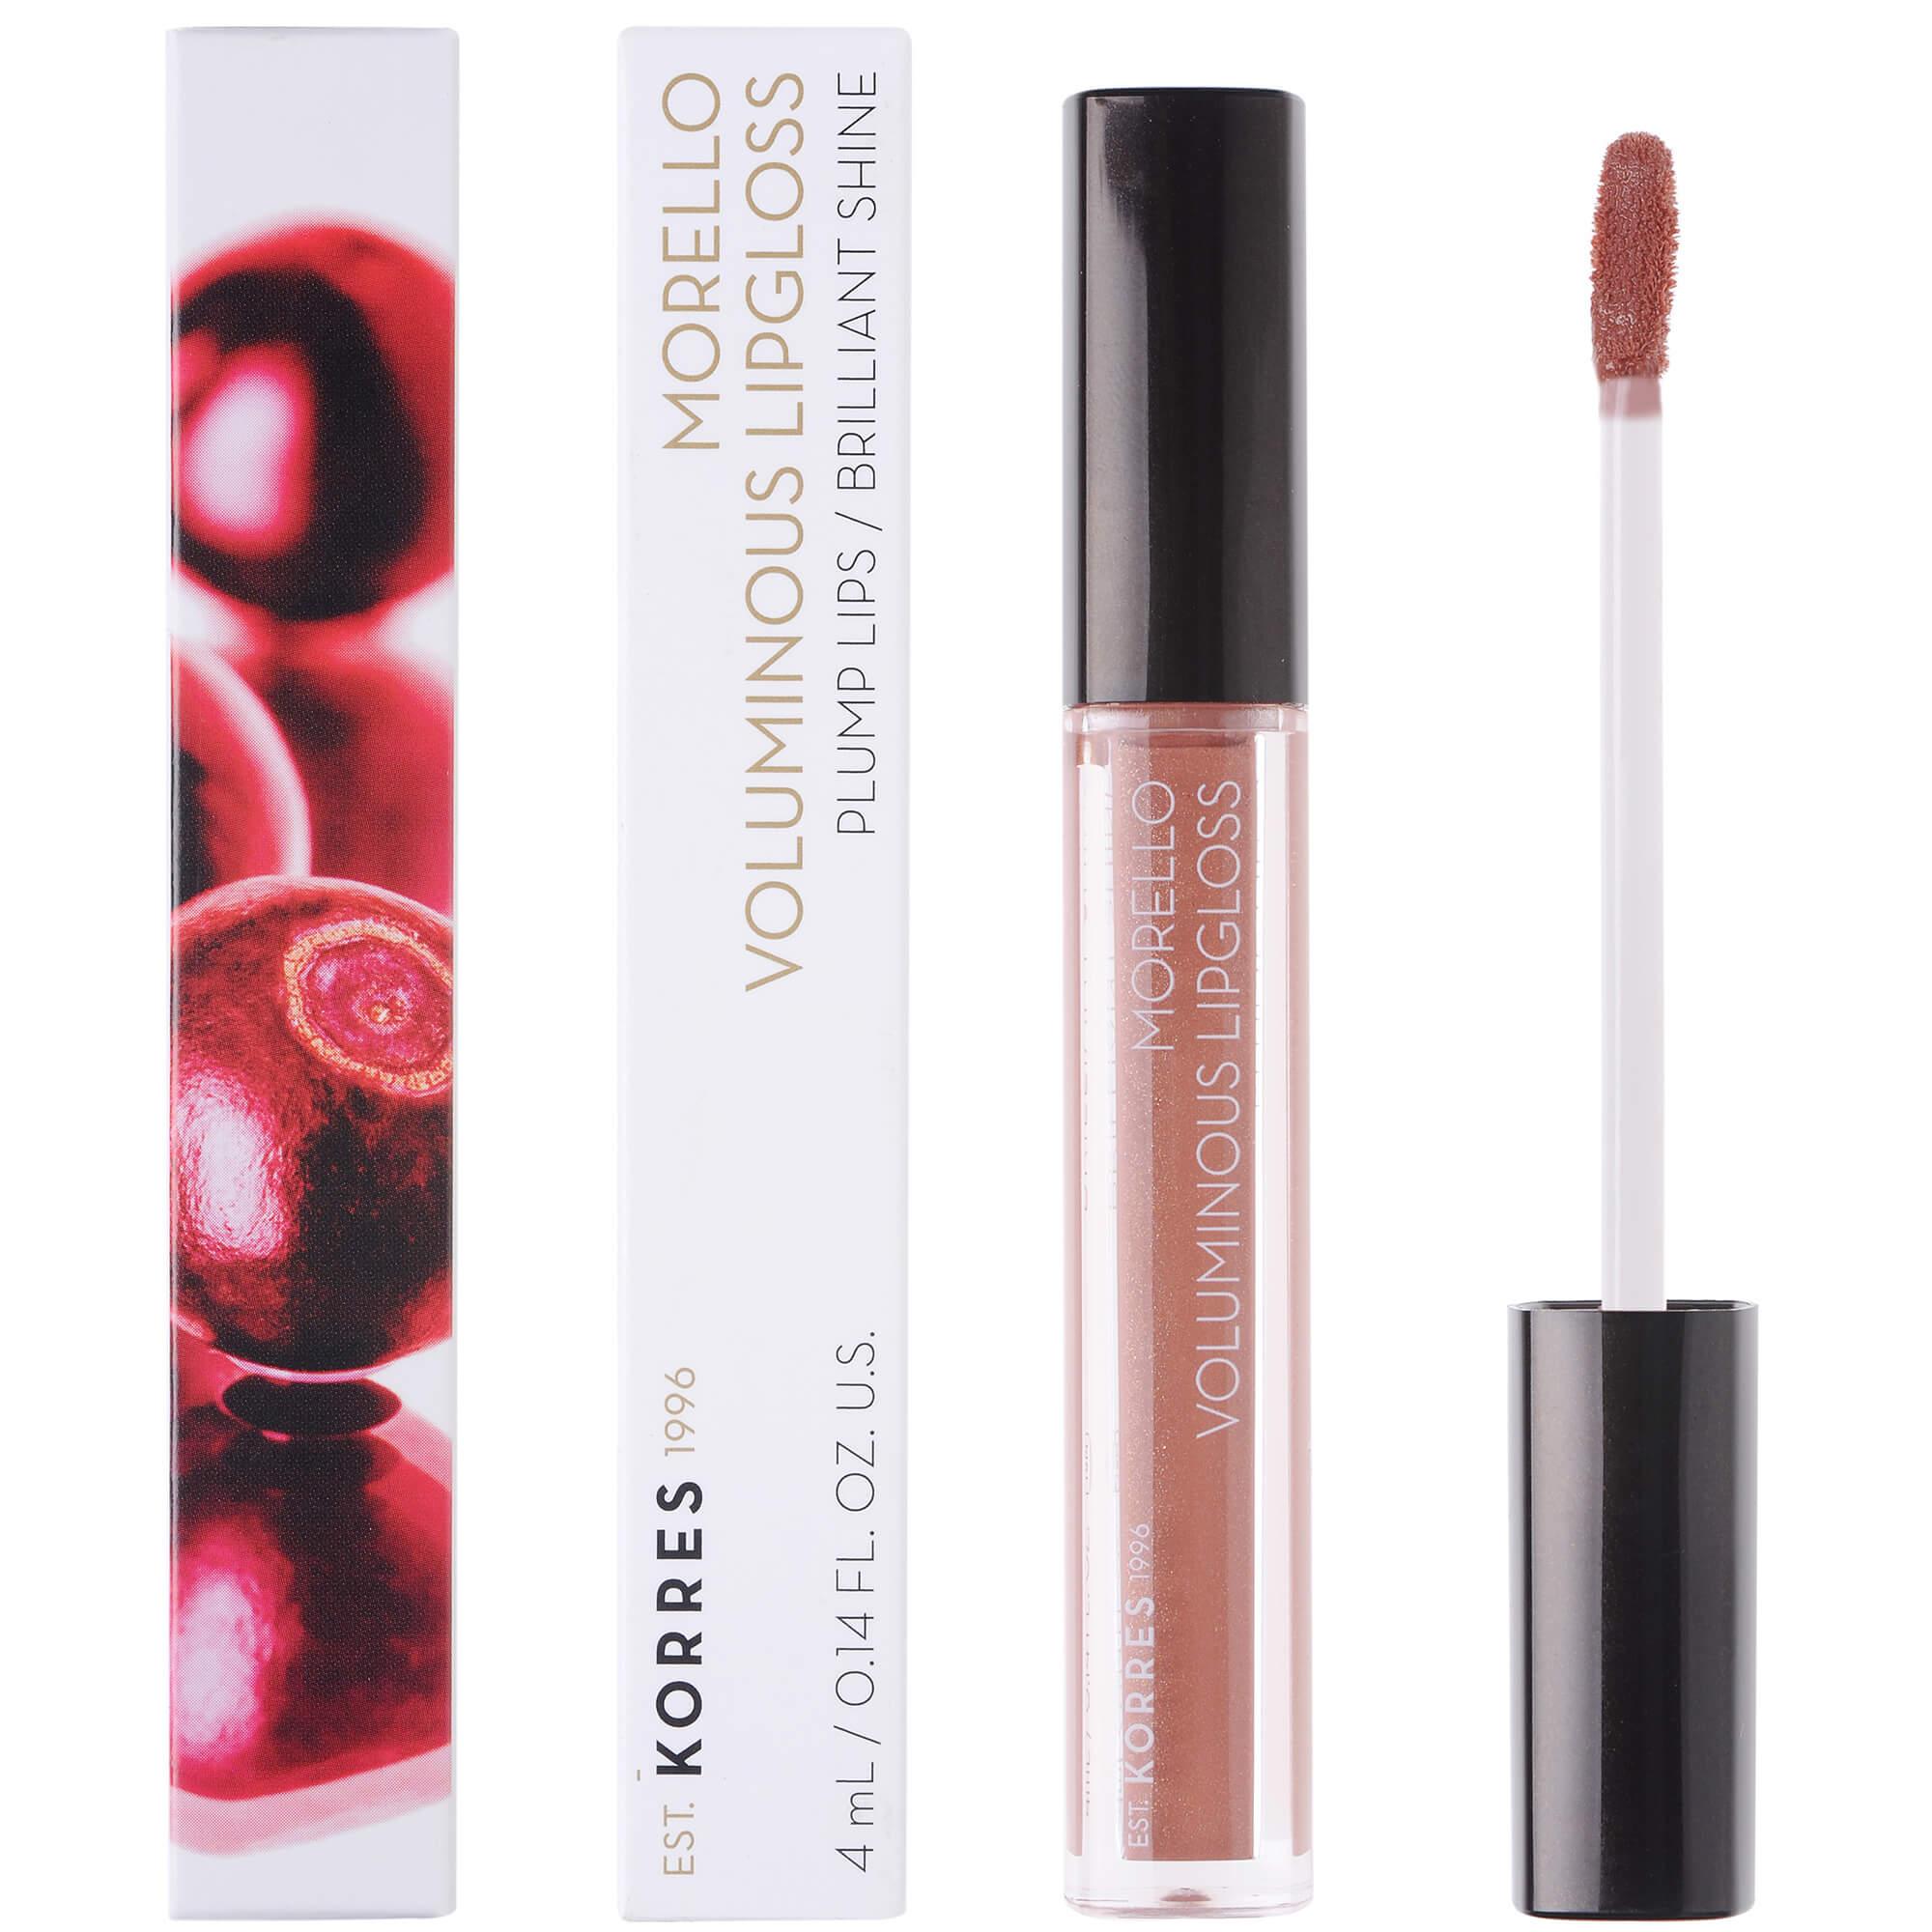 Korres Morello Voluminous Lipgloss Brilliant Shine Ενυδατικό Lipgloss με Εξαιρετική Λάμψη & Γεμάτο Χρώμα που Διαρκεί 4ml – 31 Bronze Nude